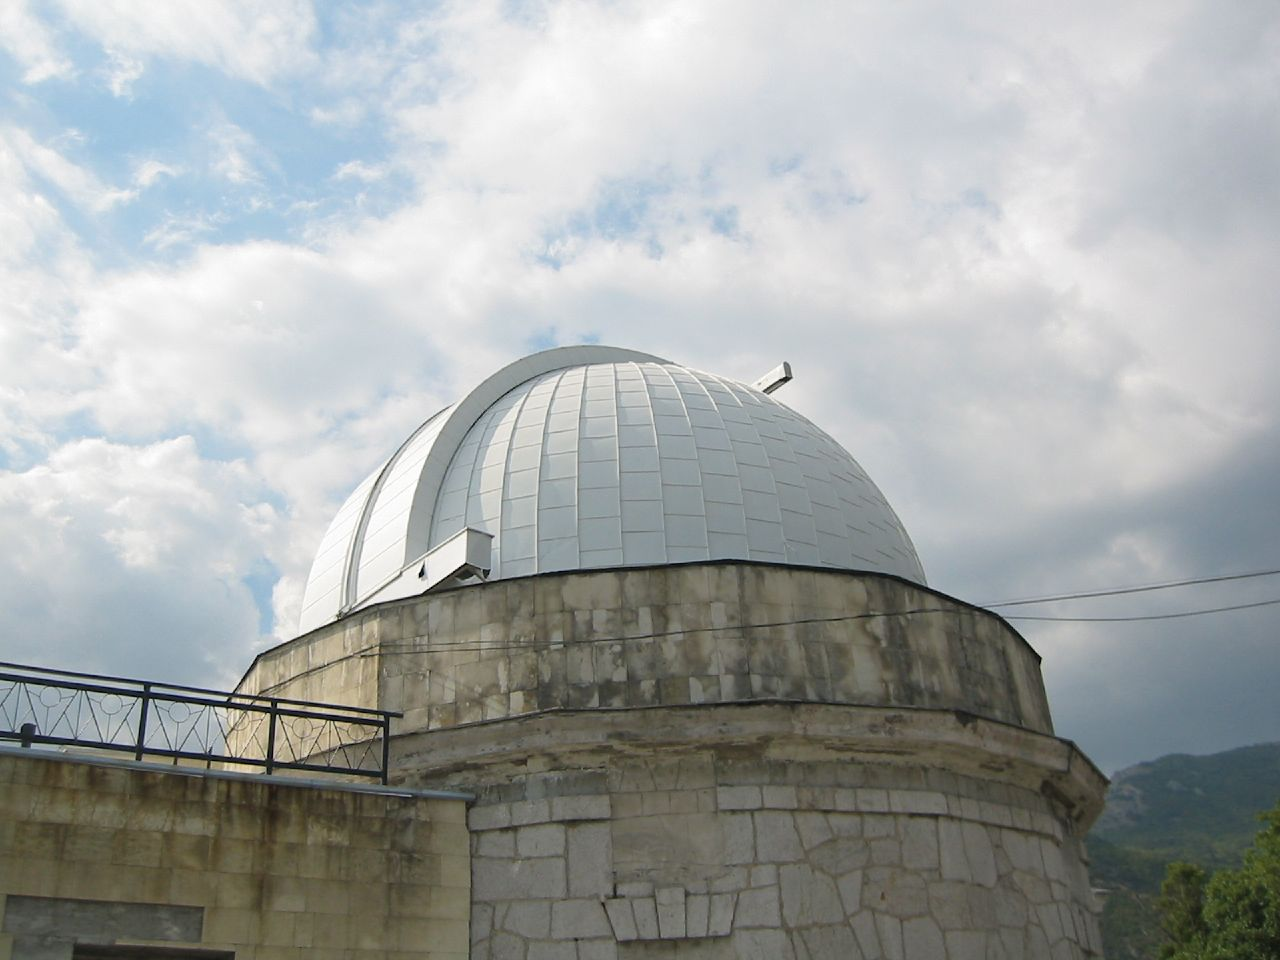 astronomy observatory - photo #37